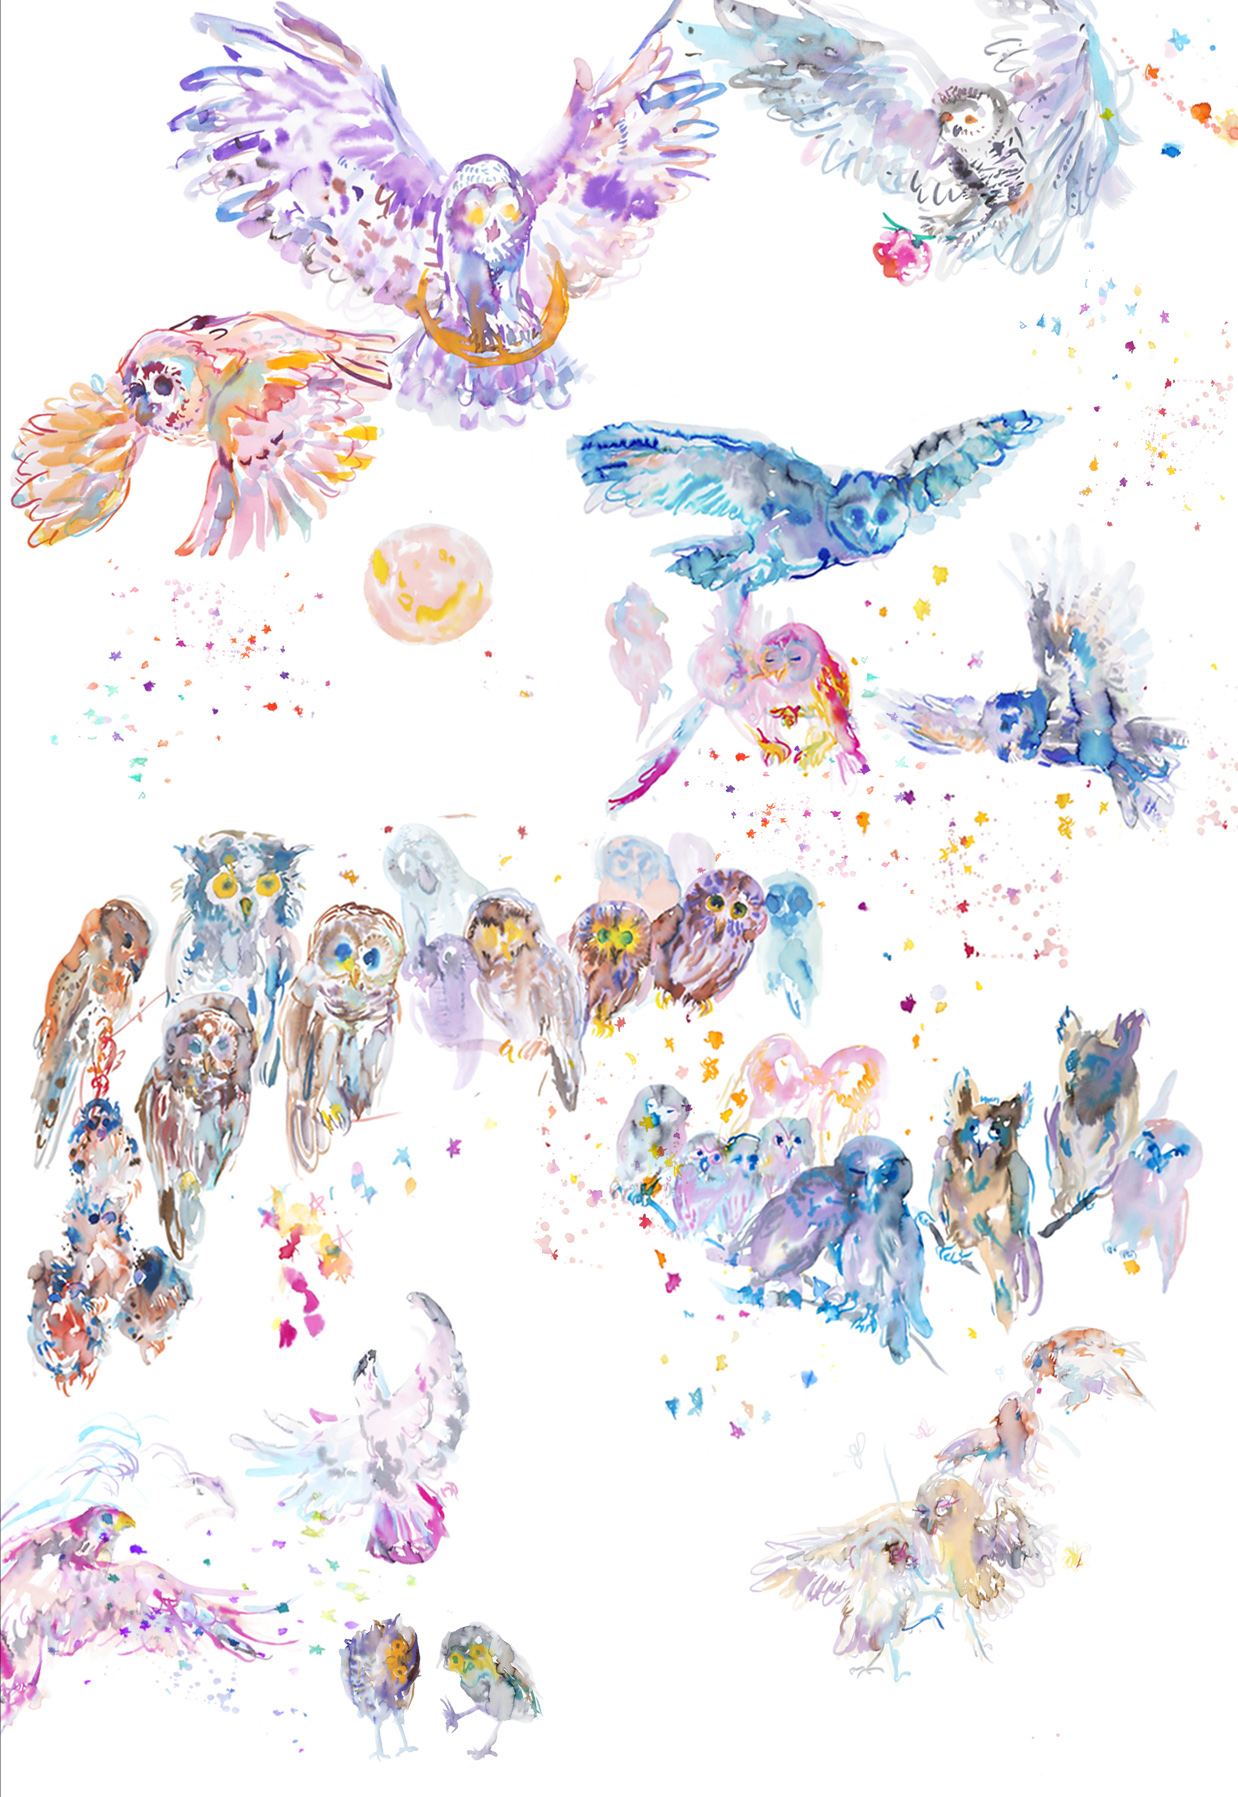 howlingtableau a - ARTWORK DETAILS:Fine Art print of original watercolor painting.Limited editionWidth: 68 cm (approx 27